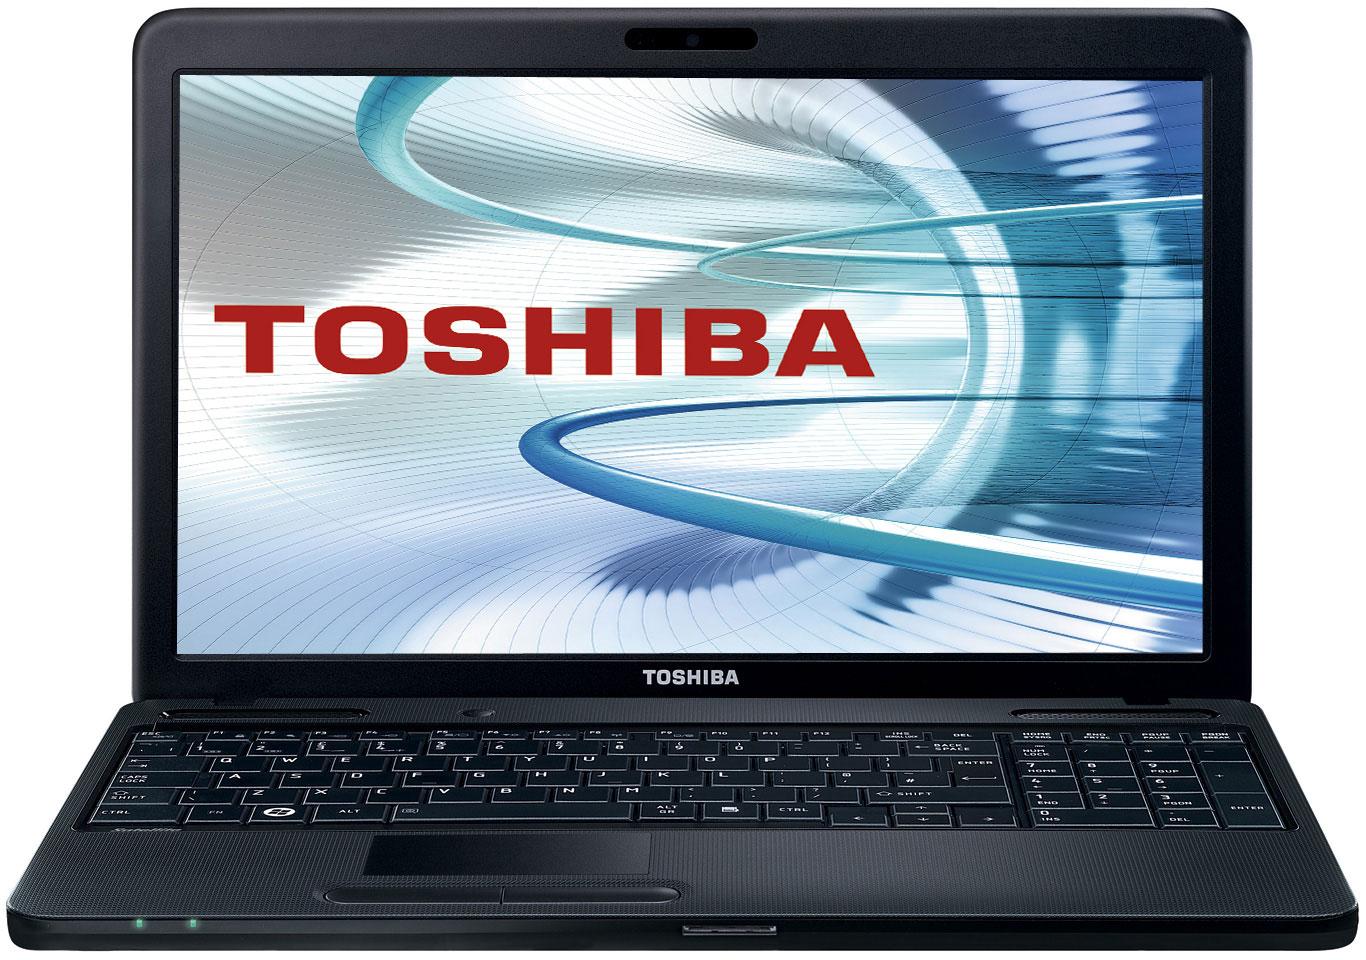 Toshiba video player xp